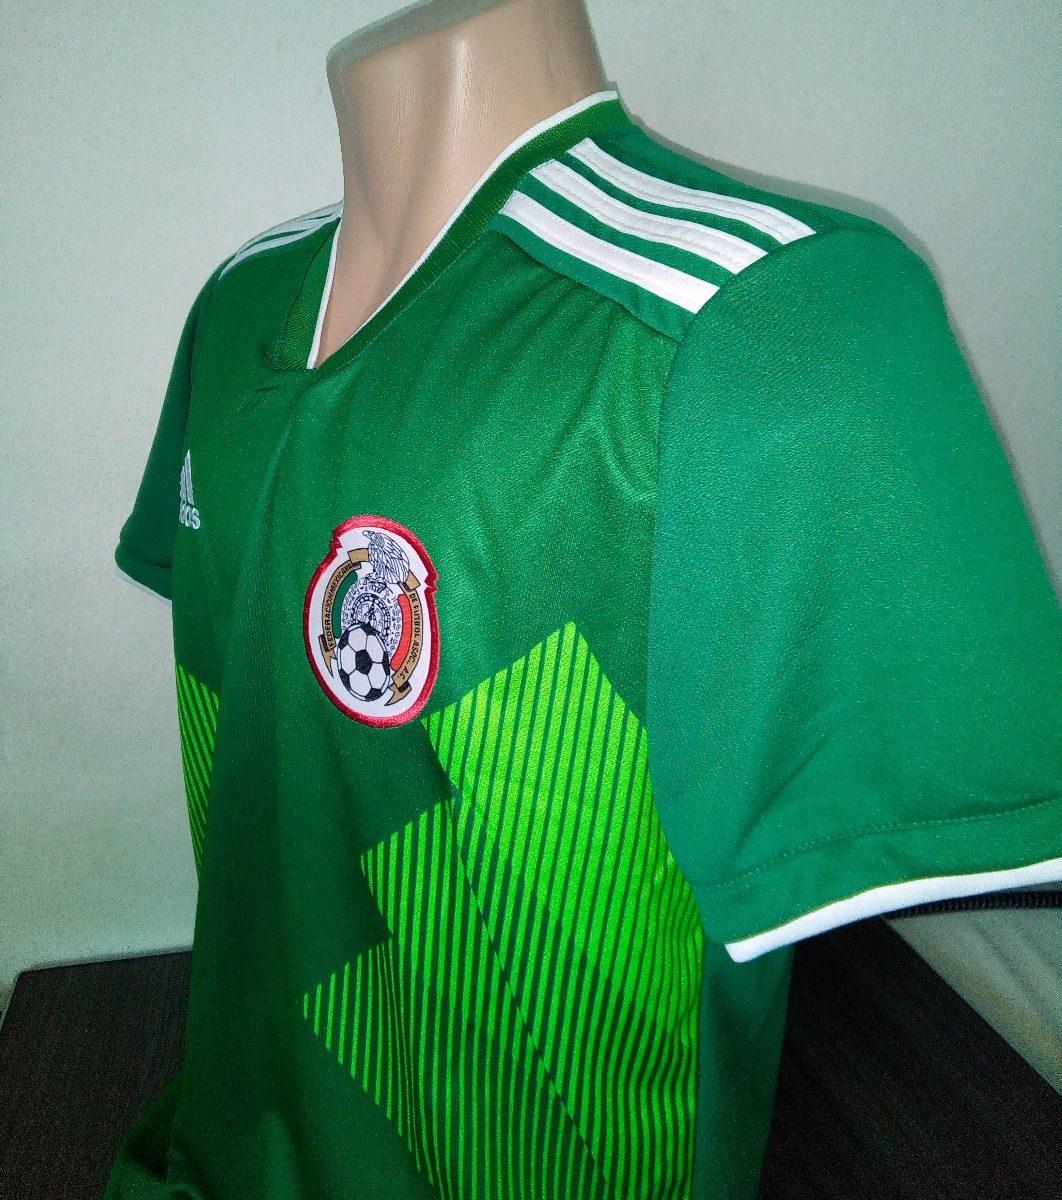 camisa méxico copa 2018 supporter torcedor verde. Carregando zoom. 5c41cd46f7bd3